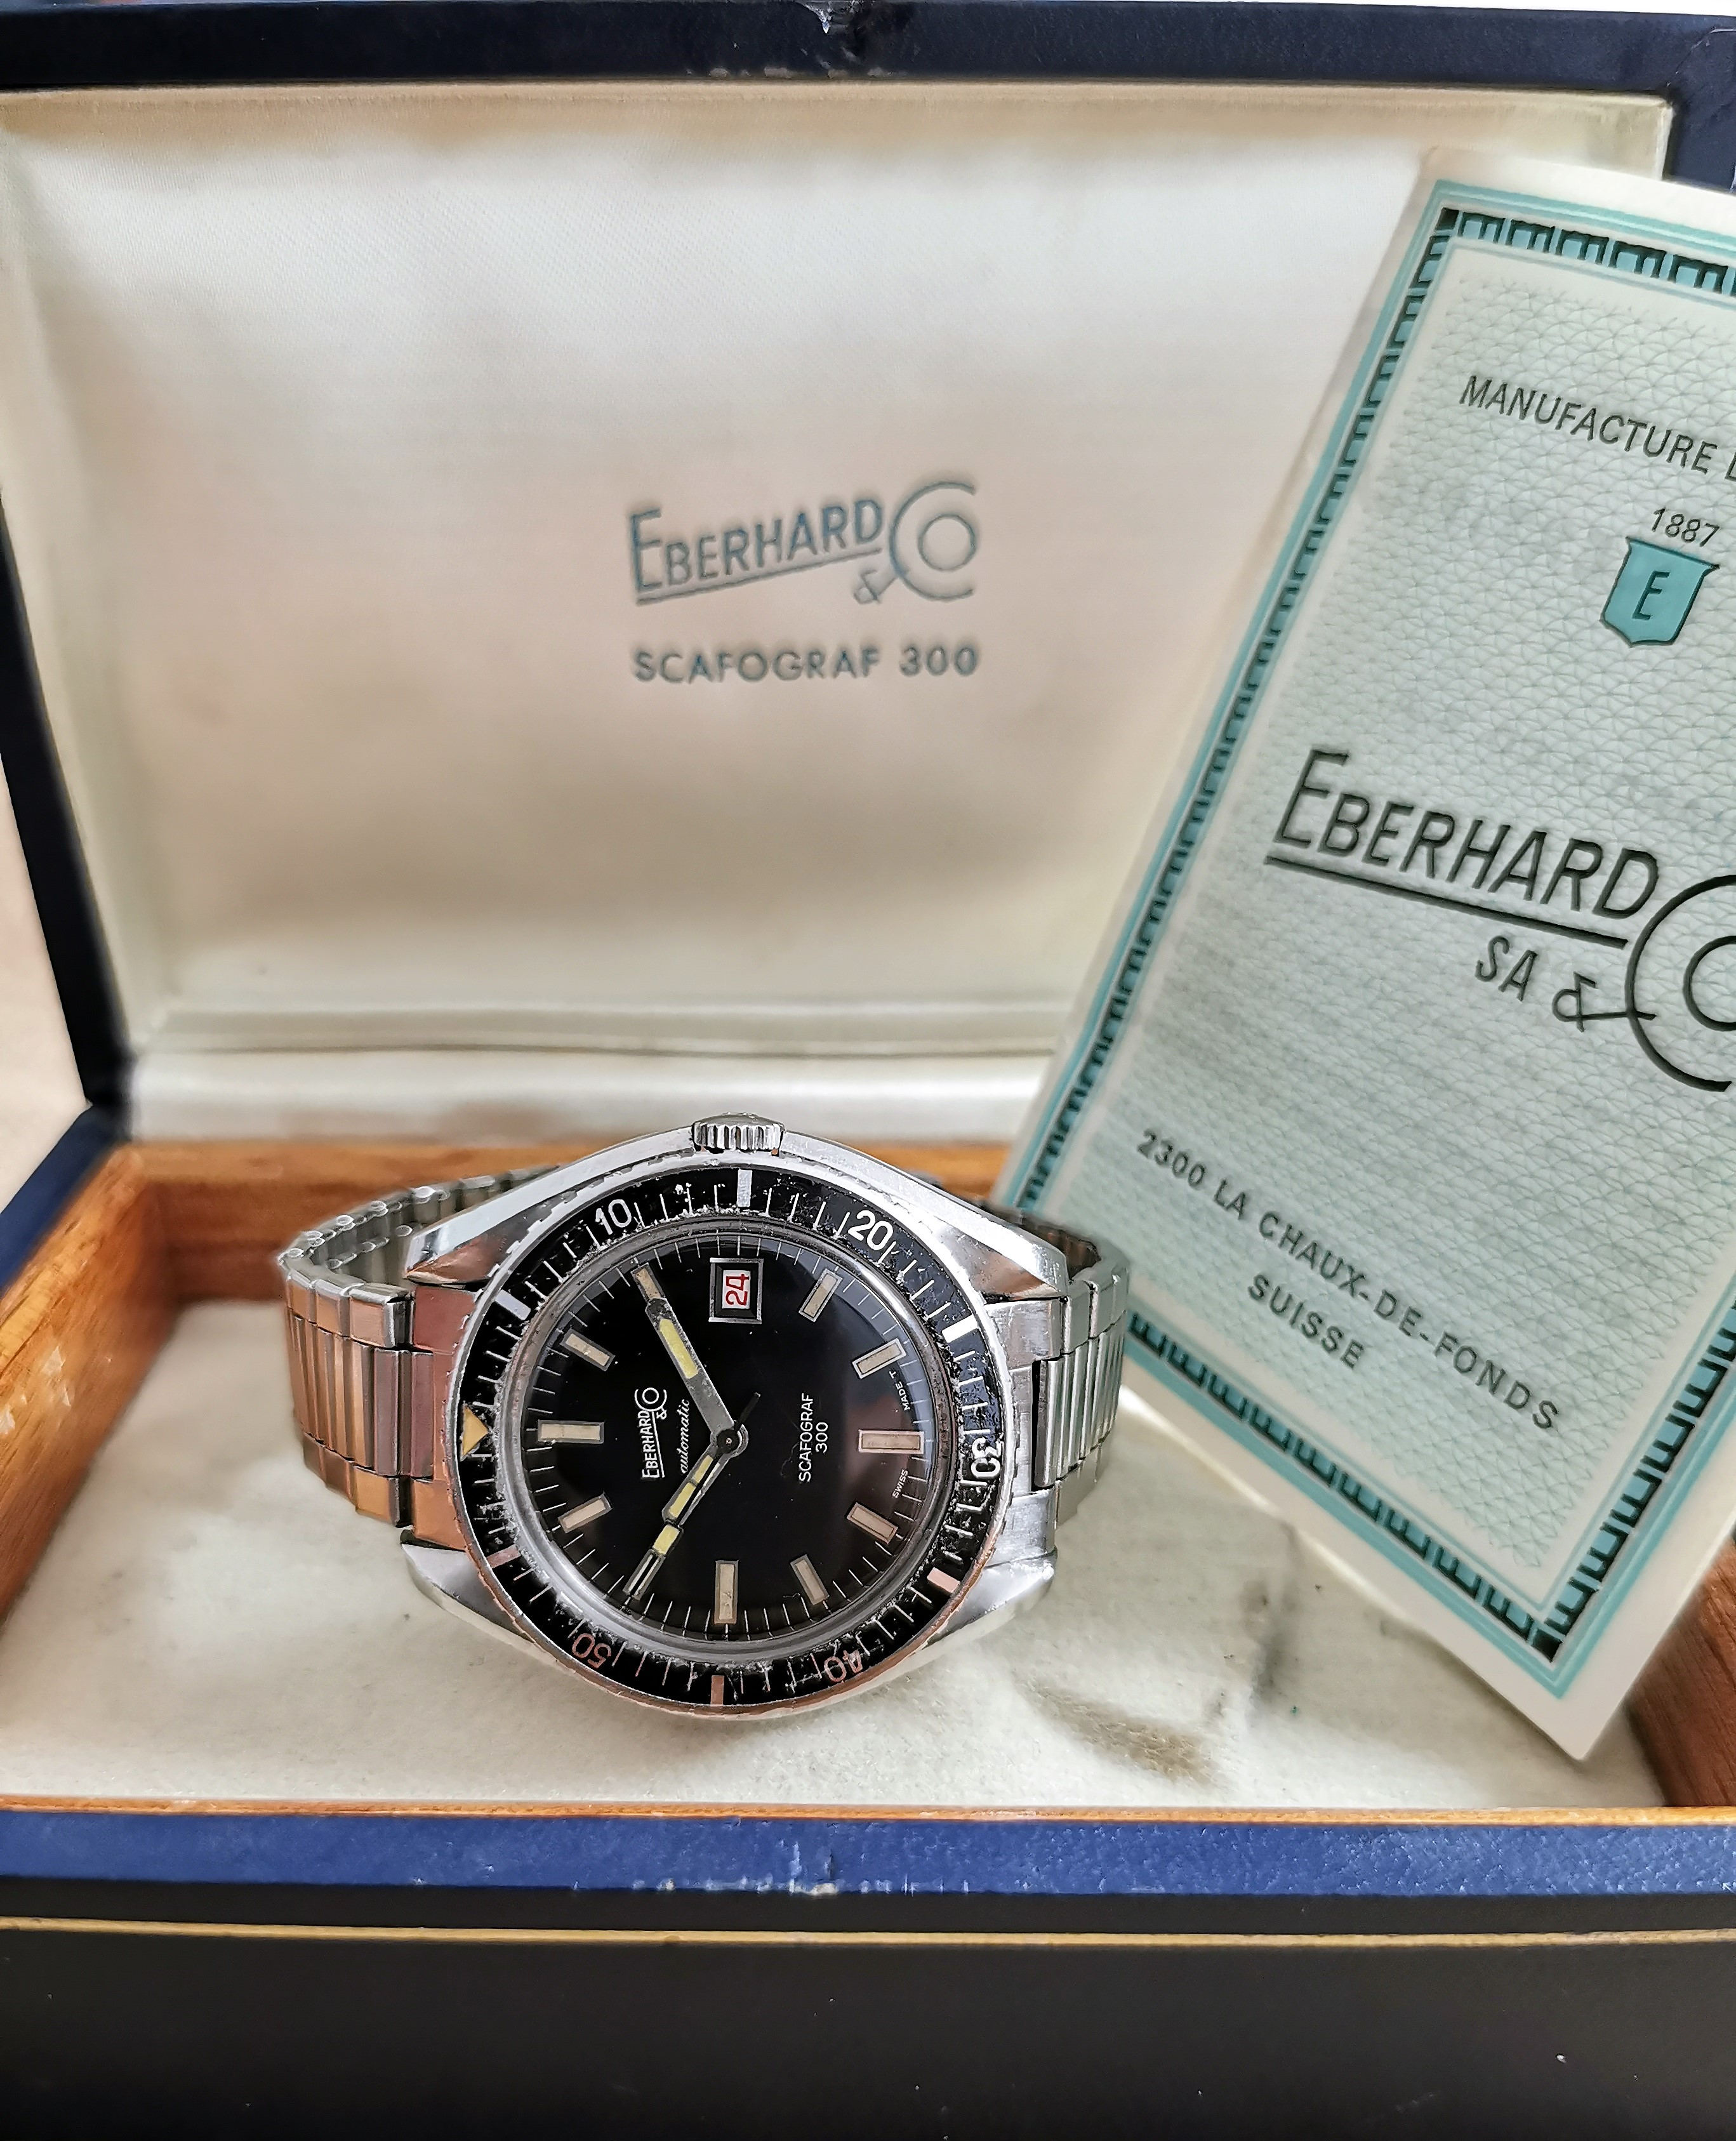 Eberhard & Co. Scafograf 300 rare vintage diver Scafograf 300 steel mm 43 black dial elastic bracelet 4-65 full set   San Giorgio a Cremano